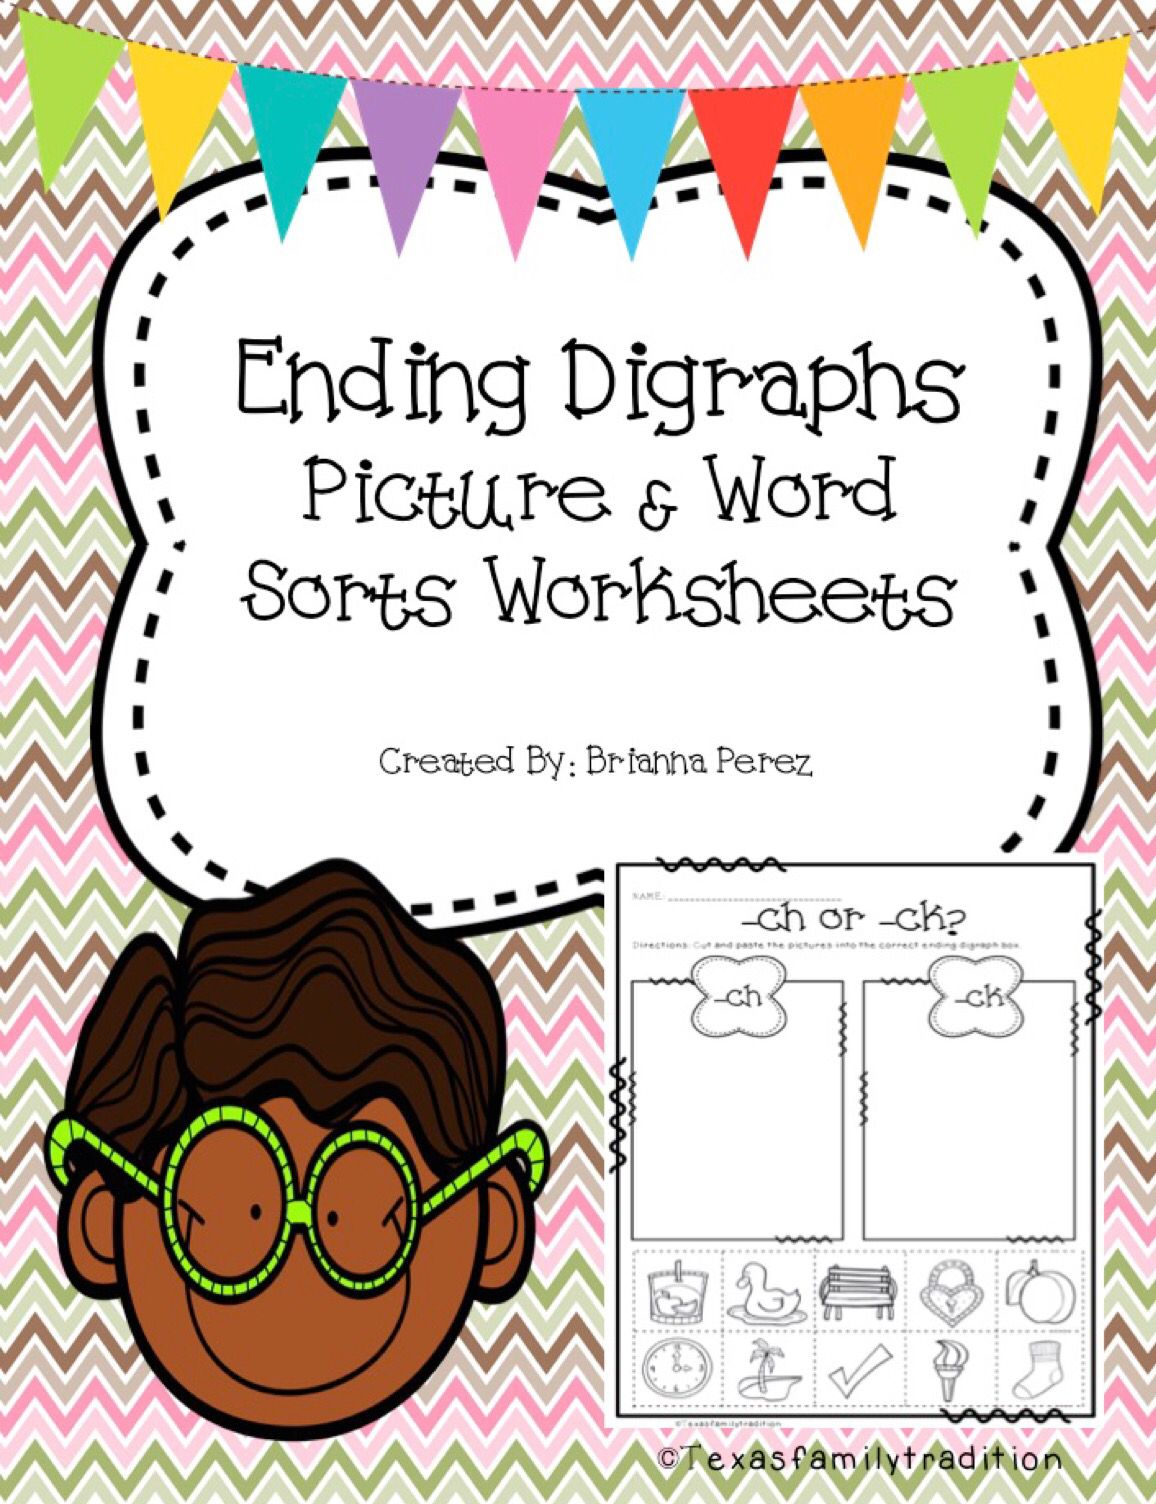 Ending Digraphs Worksheet Sorts With Images